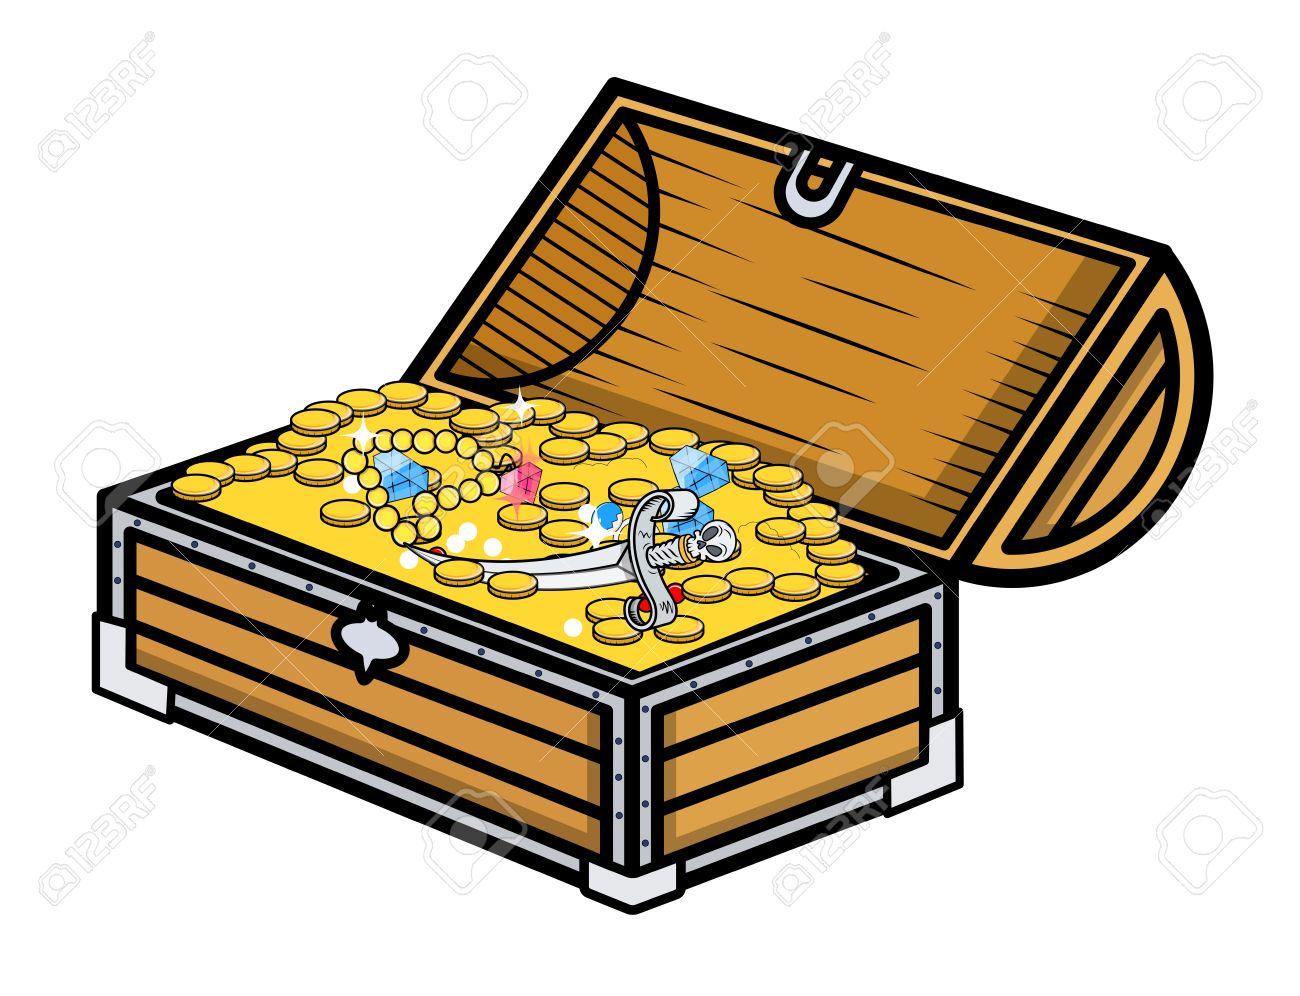 treasure box cartoon vector illustration royalty free cliparts rh 123rf com treasure box clipart